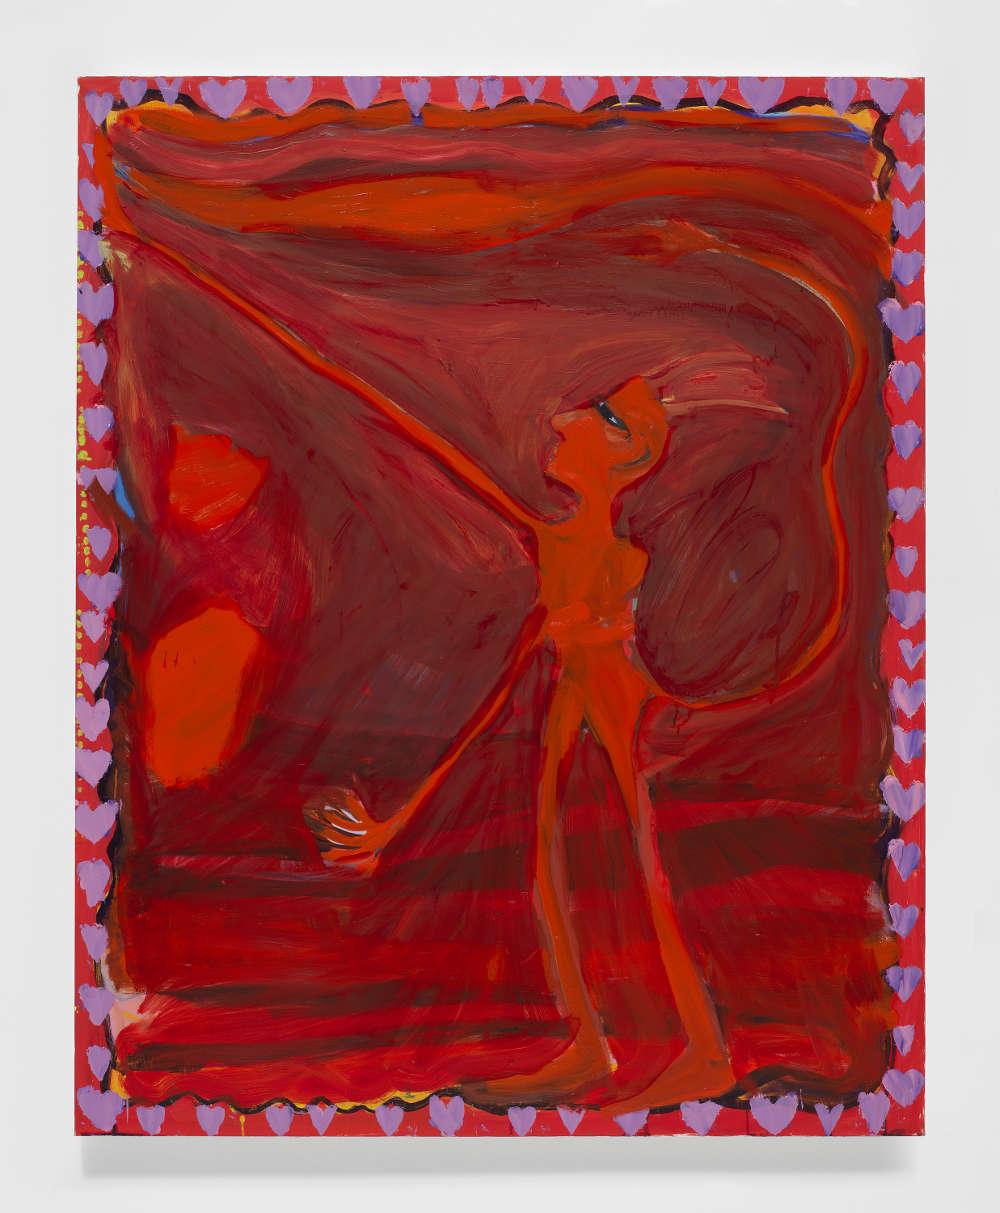 Josh Smith, Devil, 2019. Oil on linen 60 x 48 inches 152.4 x 121.9 cm © Josh Smith. Courtesy the artist and David Zwirner